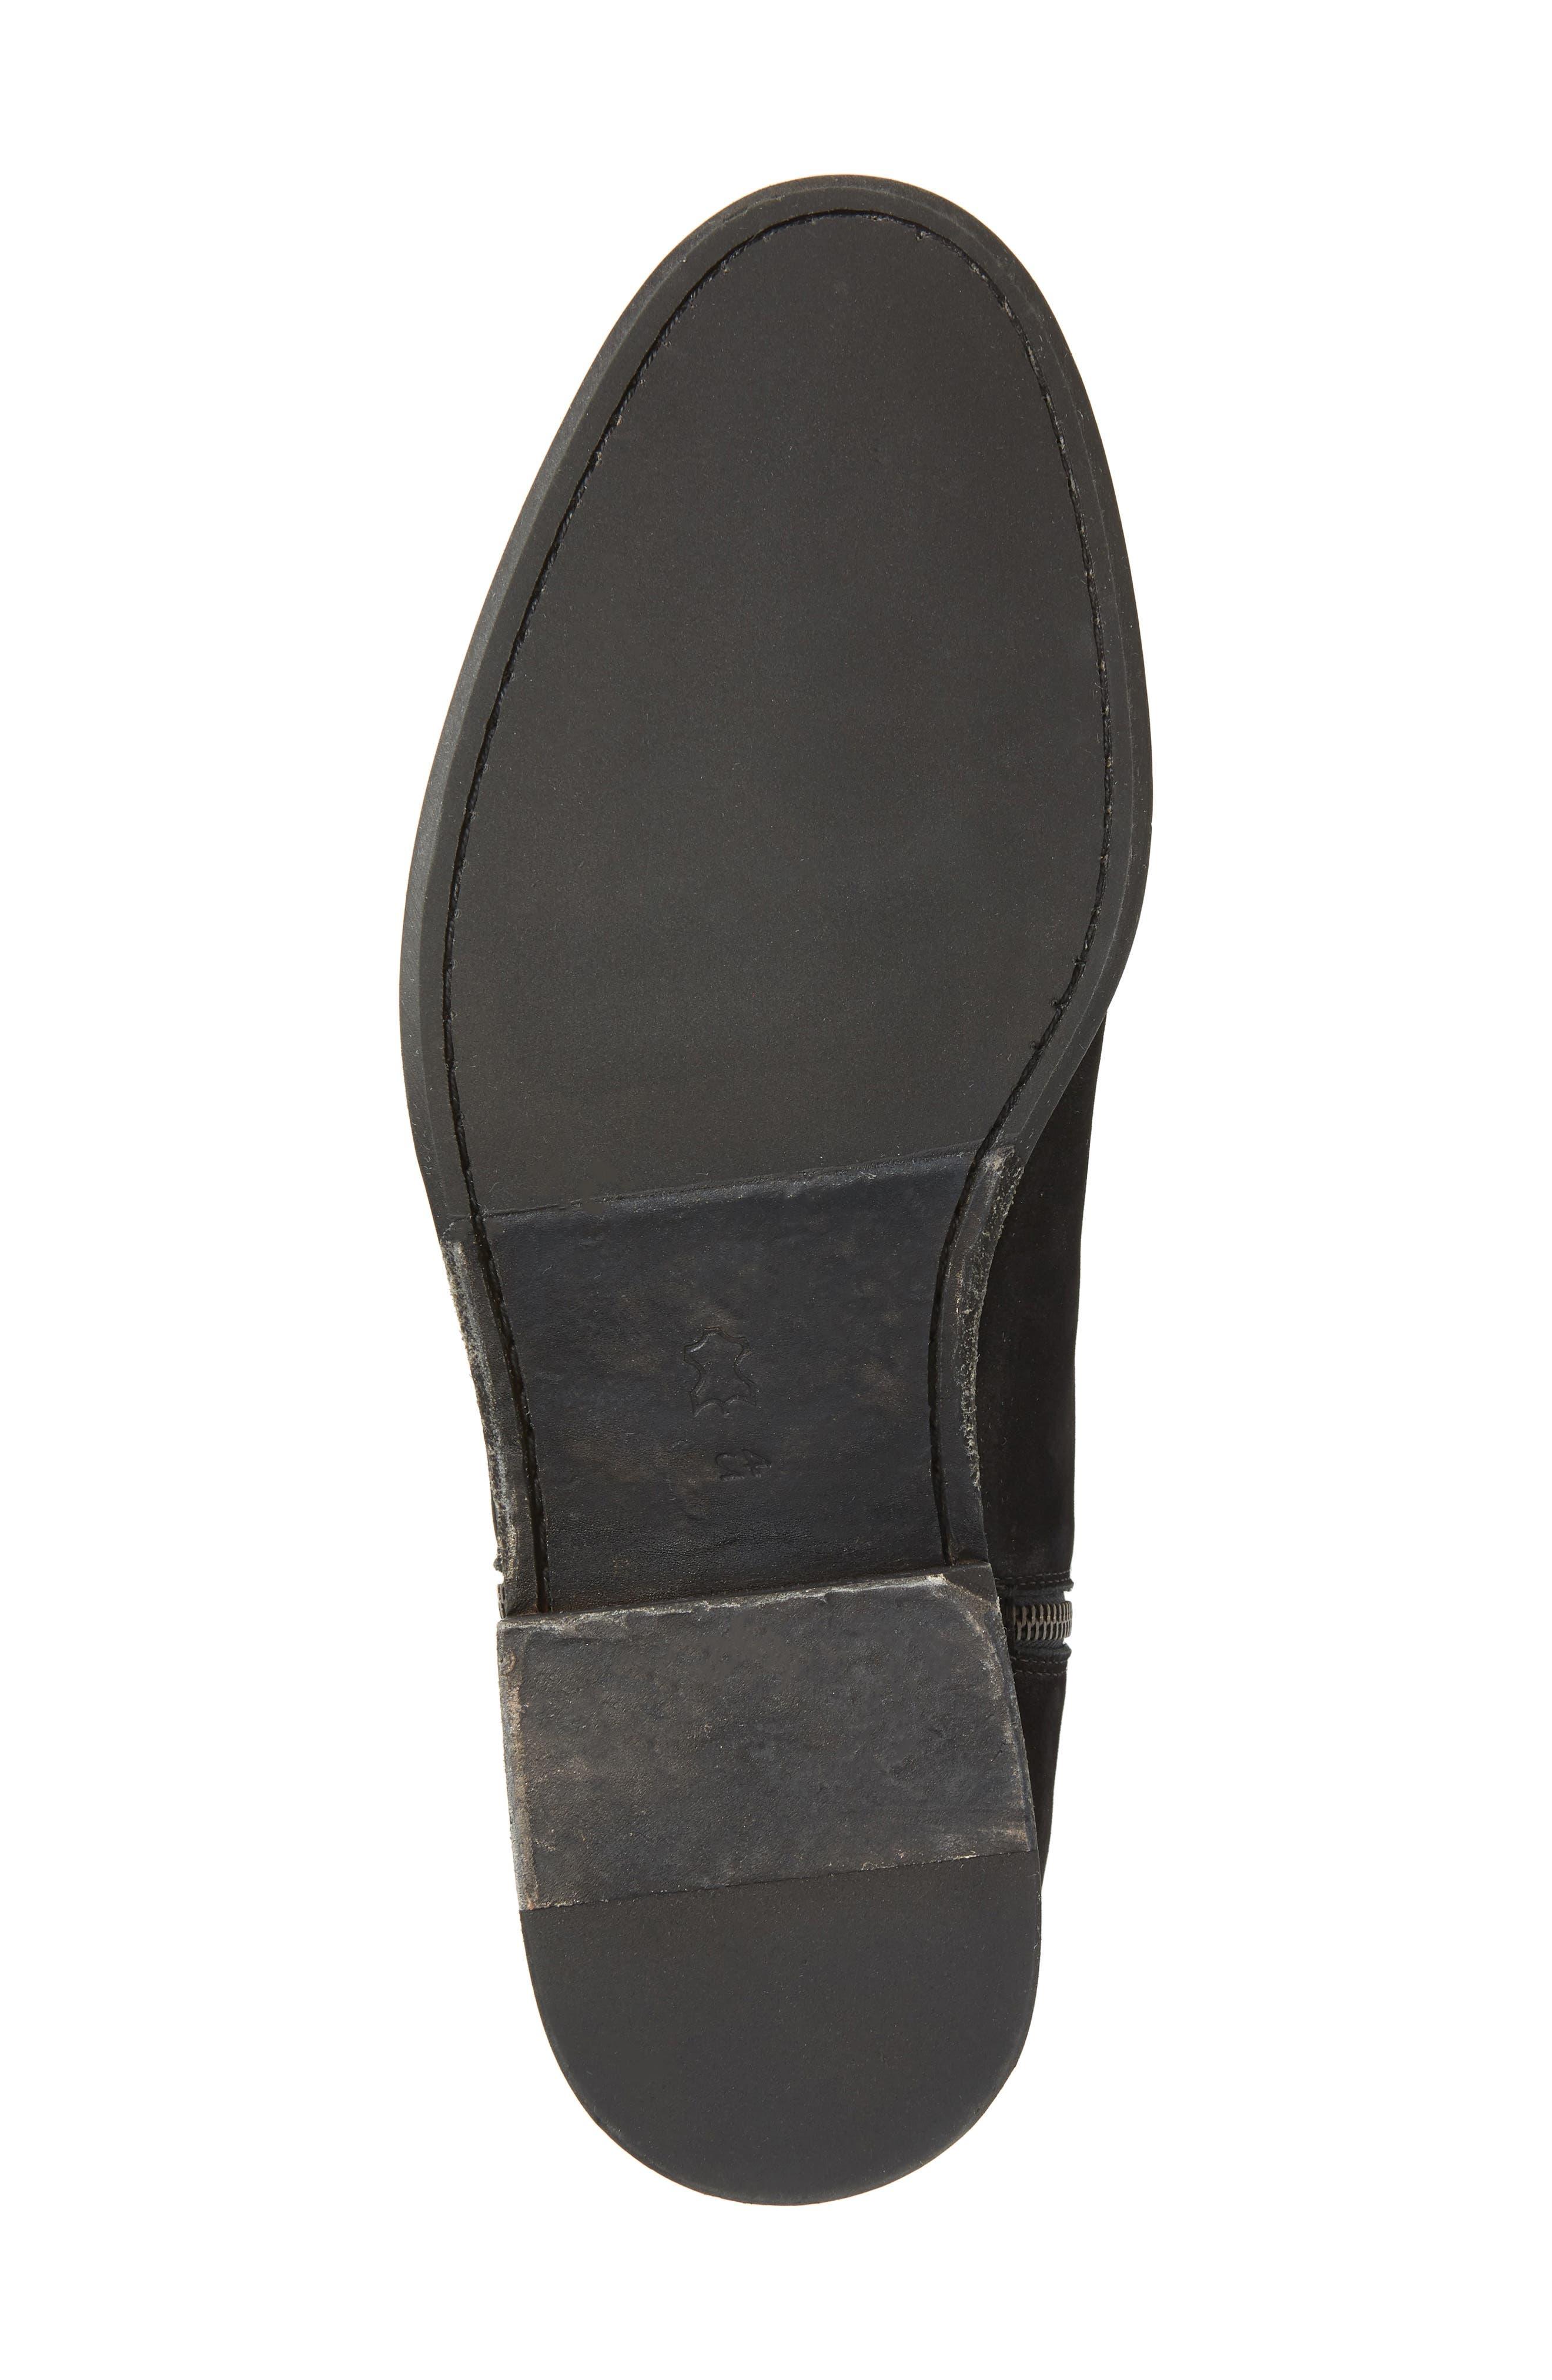 Vance Double Zipper Boot,                             Alternate thumbnail 6, color,                             BLACK LEATHER